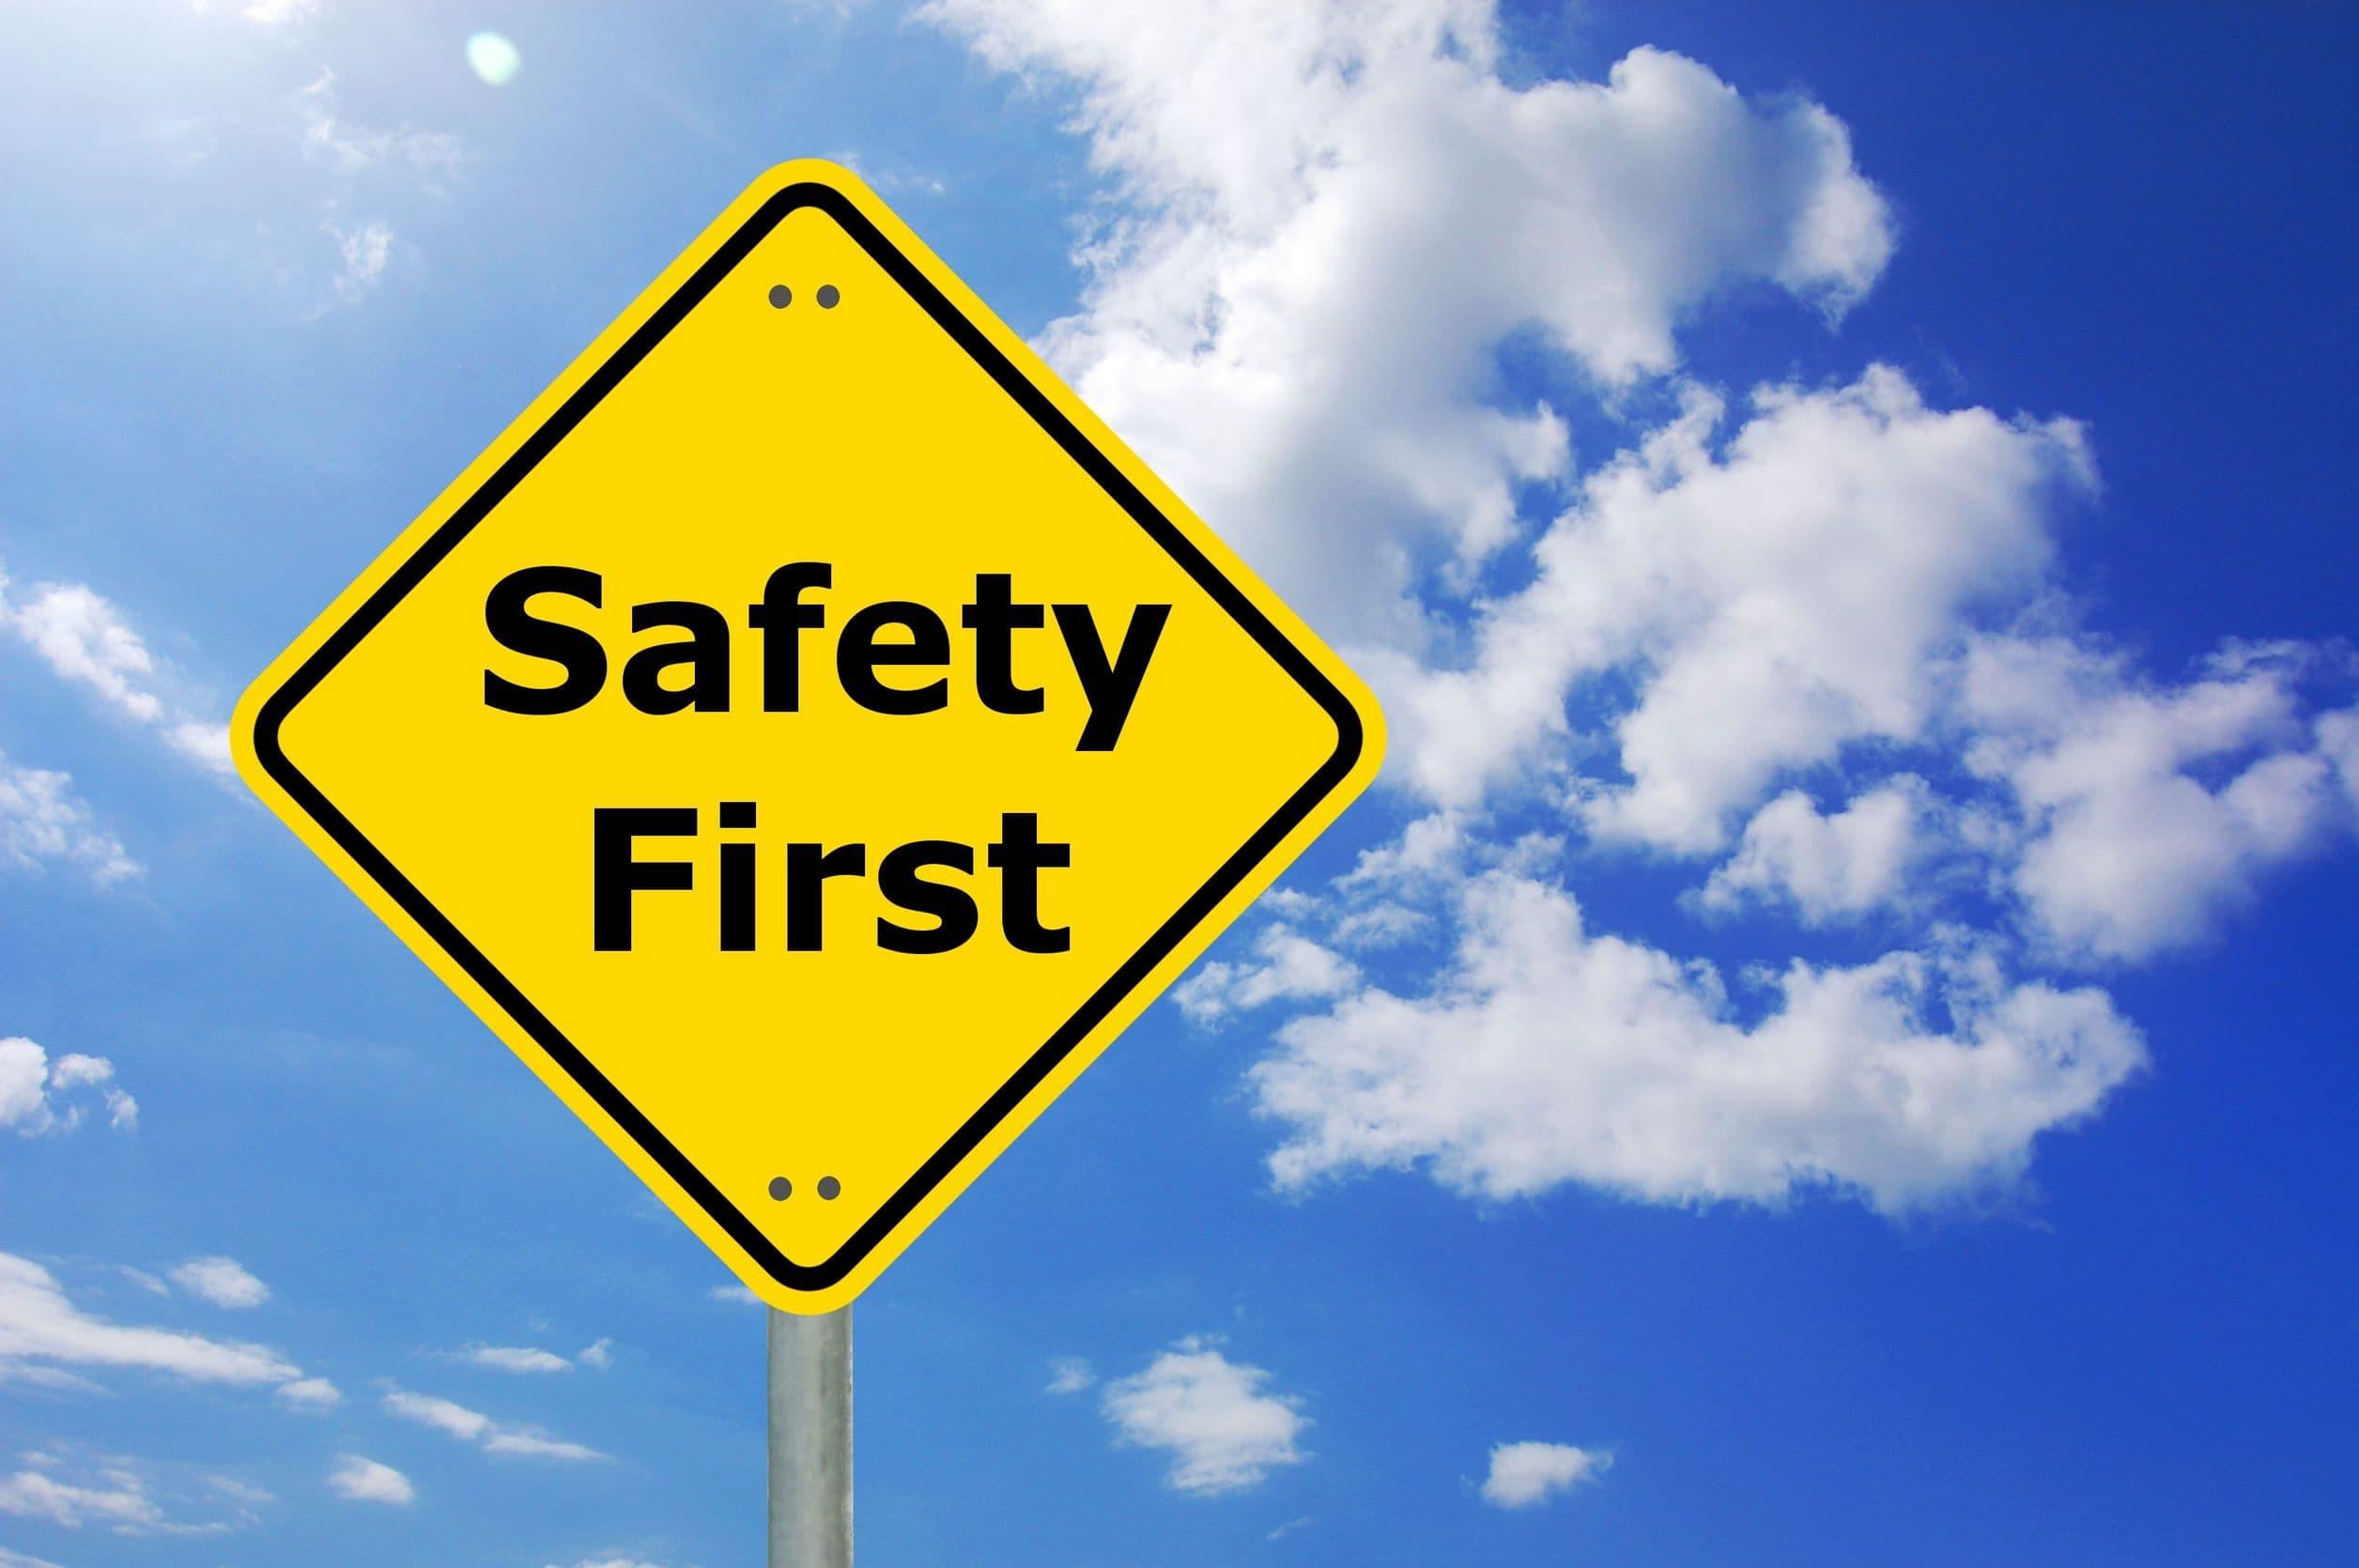 Safety, Plant safety, Accident investigation, Risk assessment